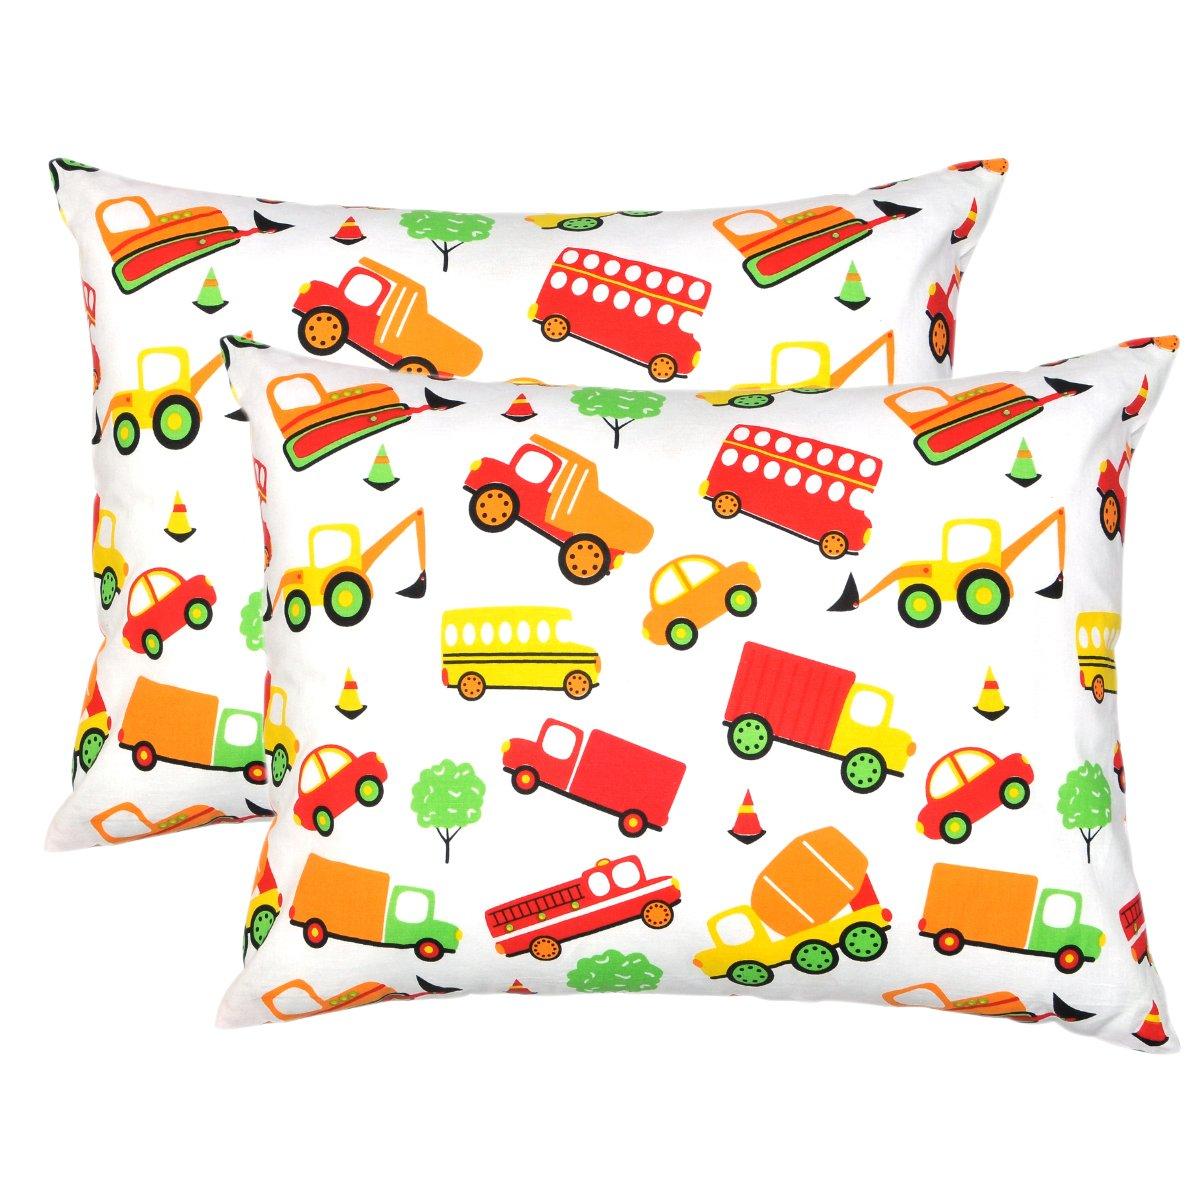 Mellanni Toddler Pillowcase Set Cars - Pack of 2 Toddler Size 14'' x 19'' - Super Soft Kids Bedding (Set of 2 Pillowcases, Cars)